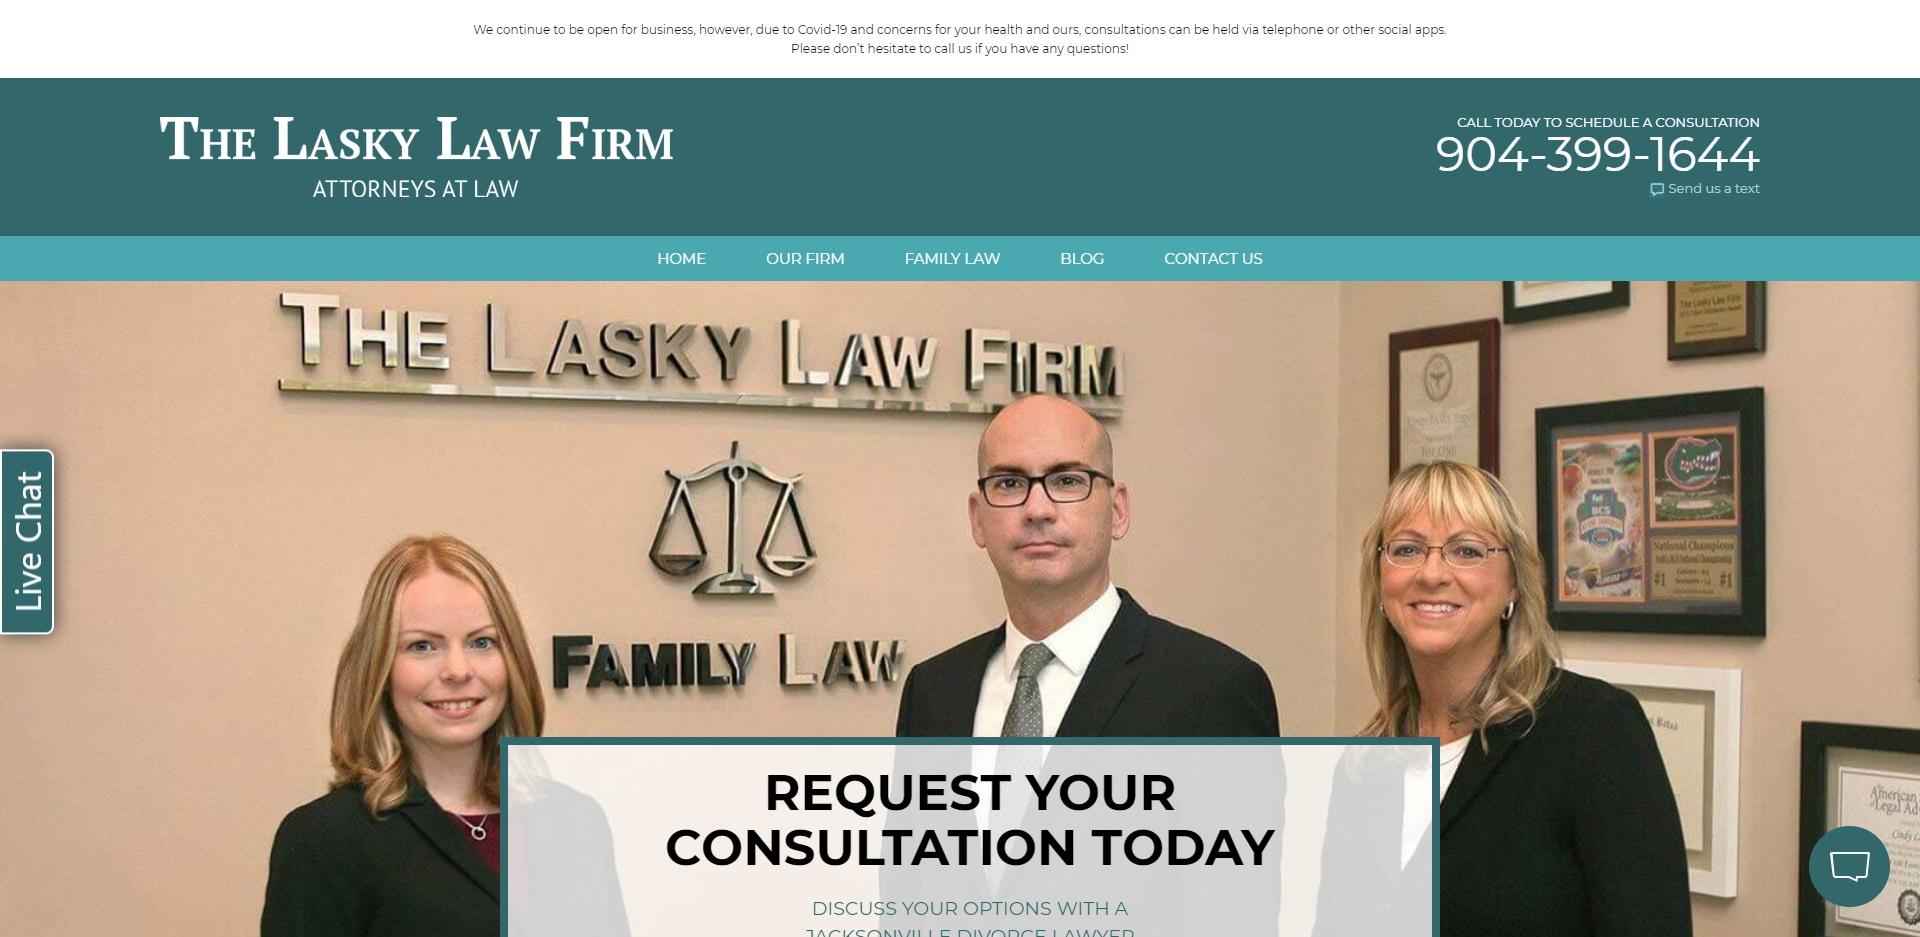 The Best Divorce Attorneys in Jacksonville